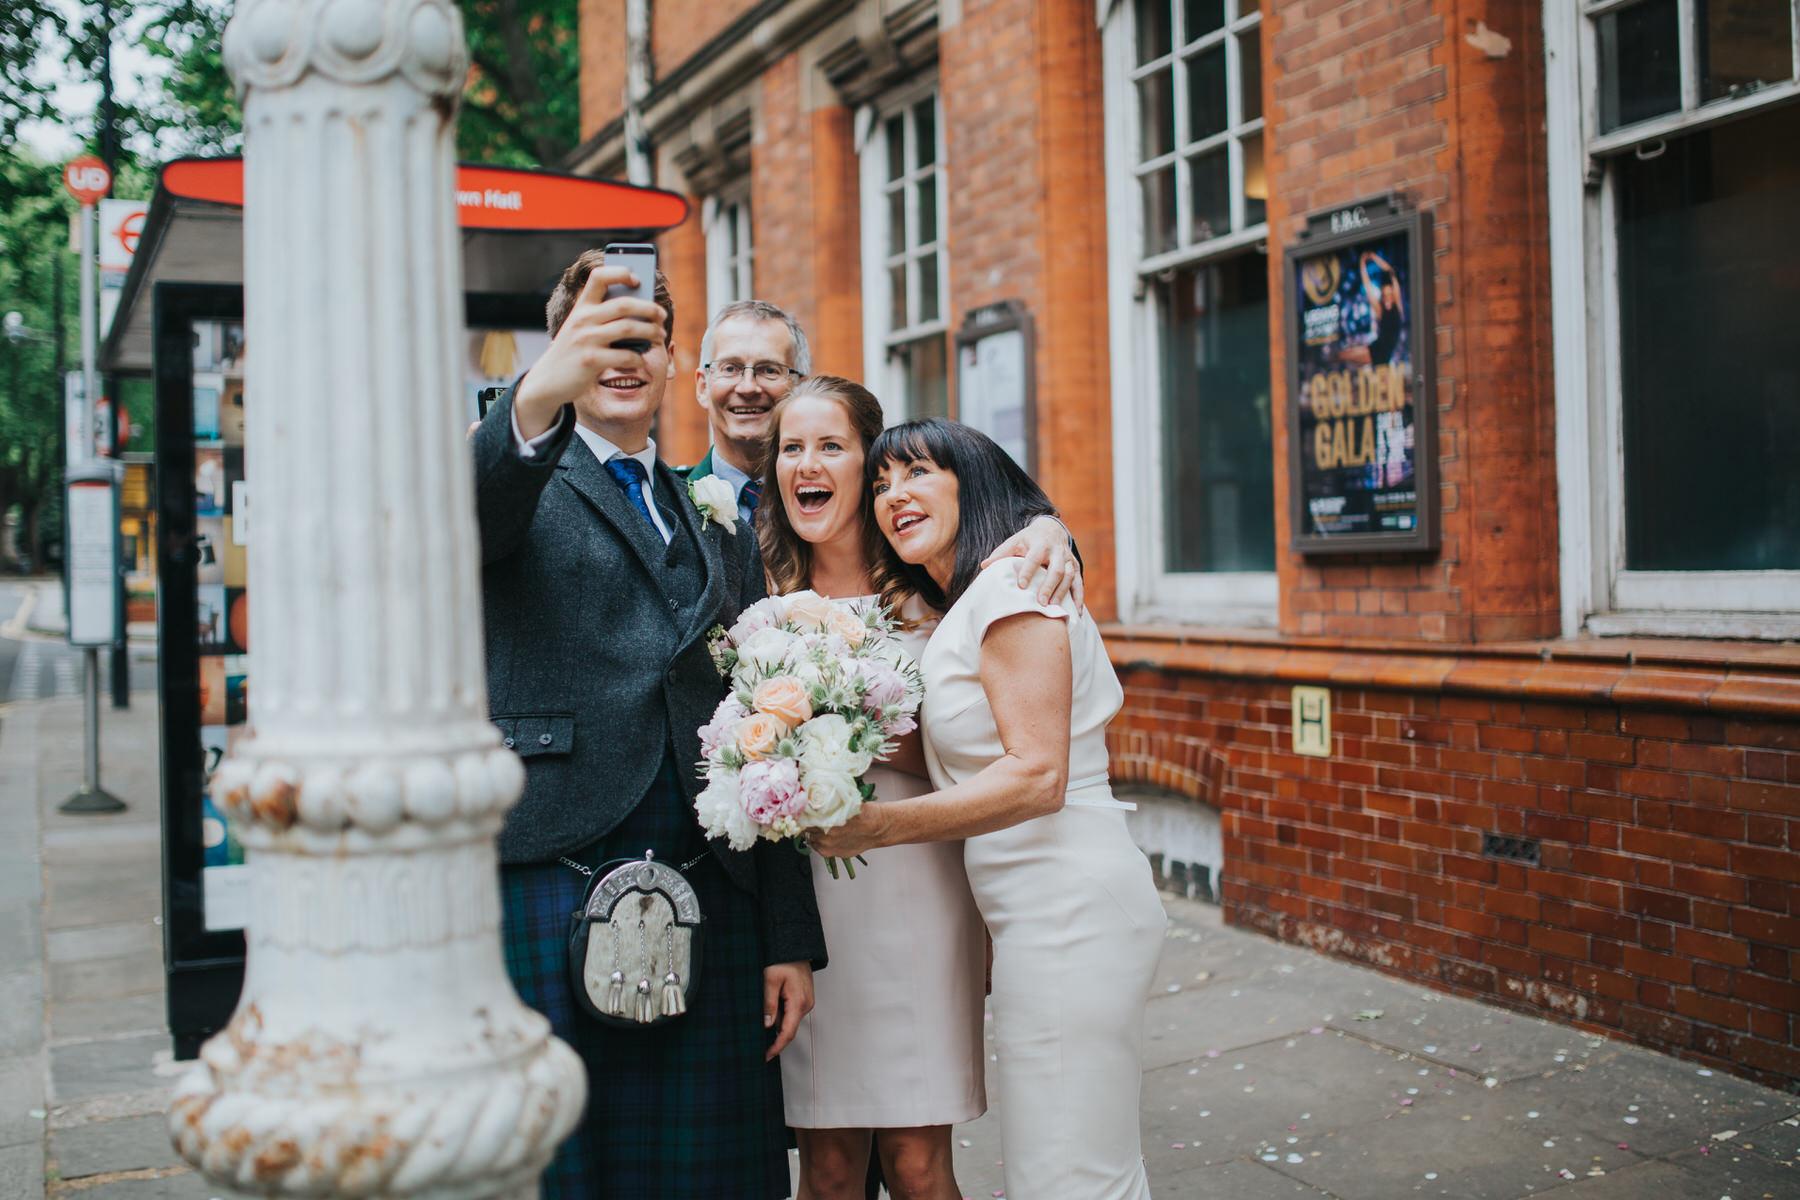 143 family taking selfie reportage wedding photographer.jpg